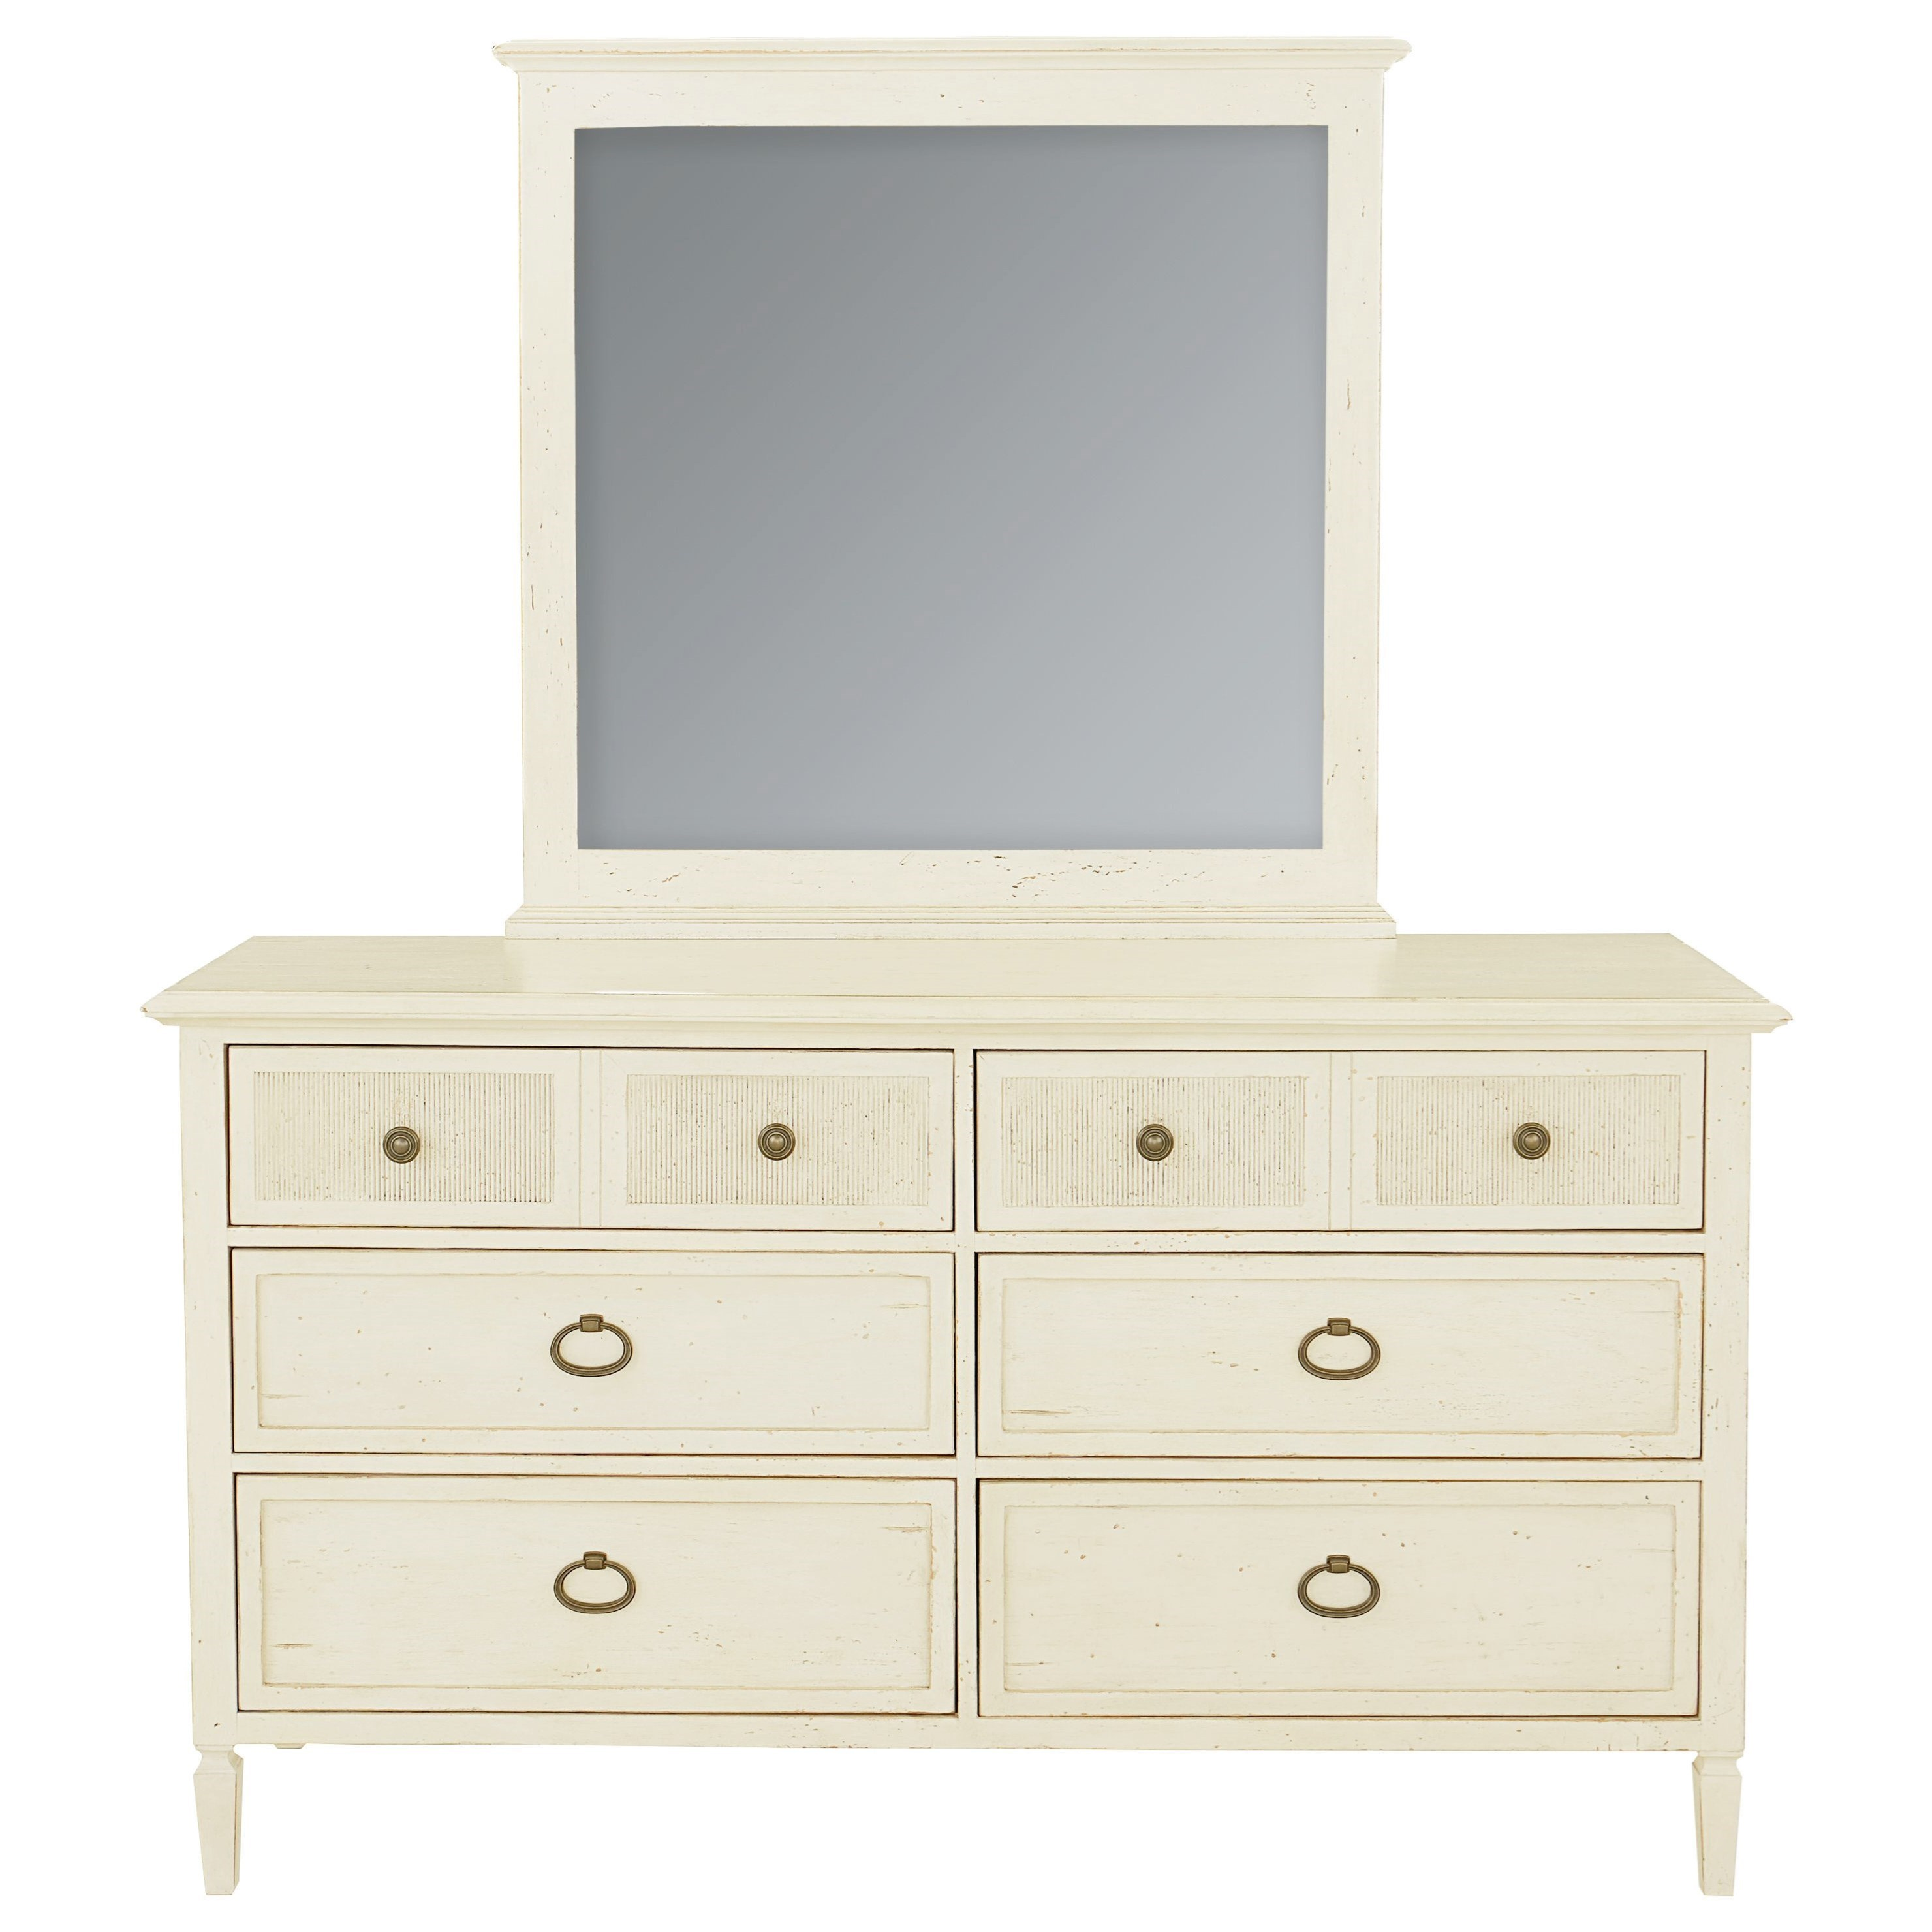 Shoreline Dresser and Mirror Set by Bassett at Suburban Furniture